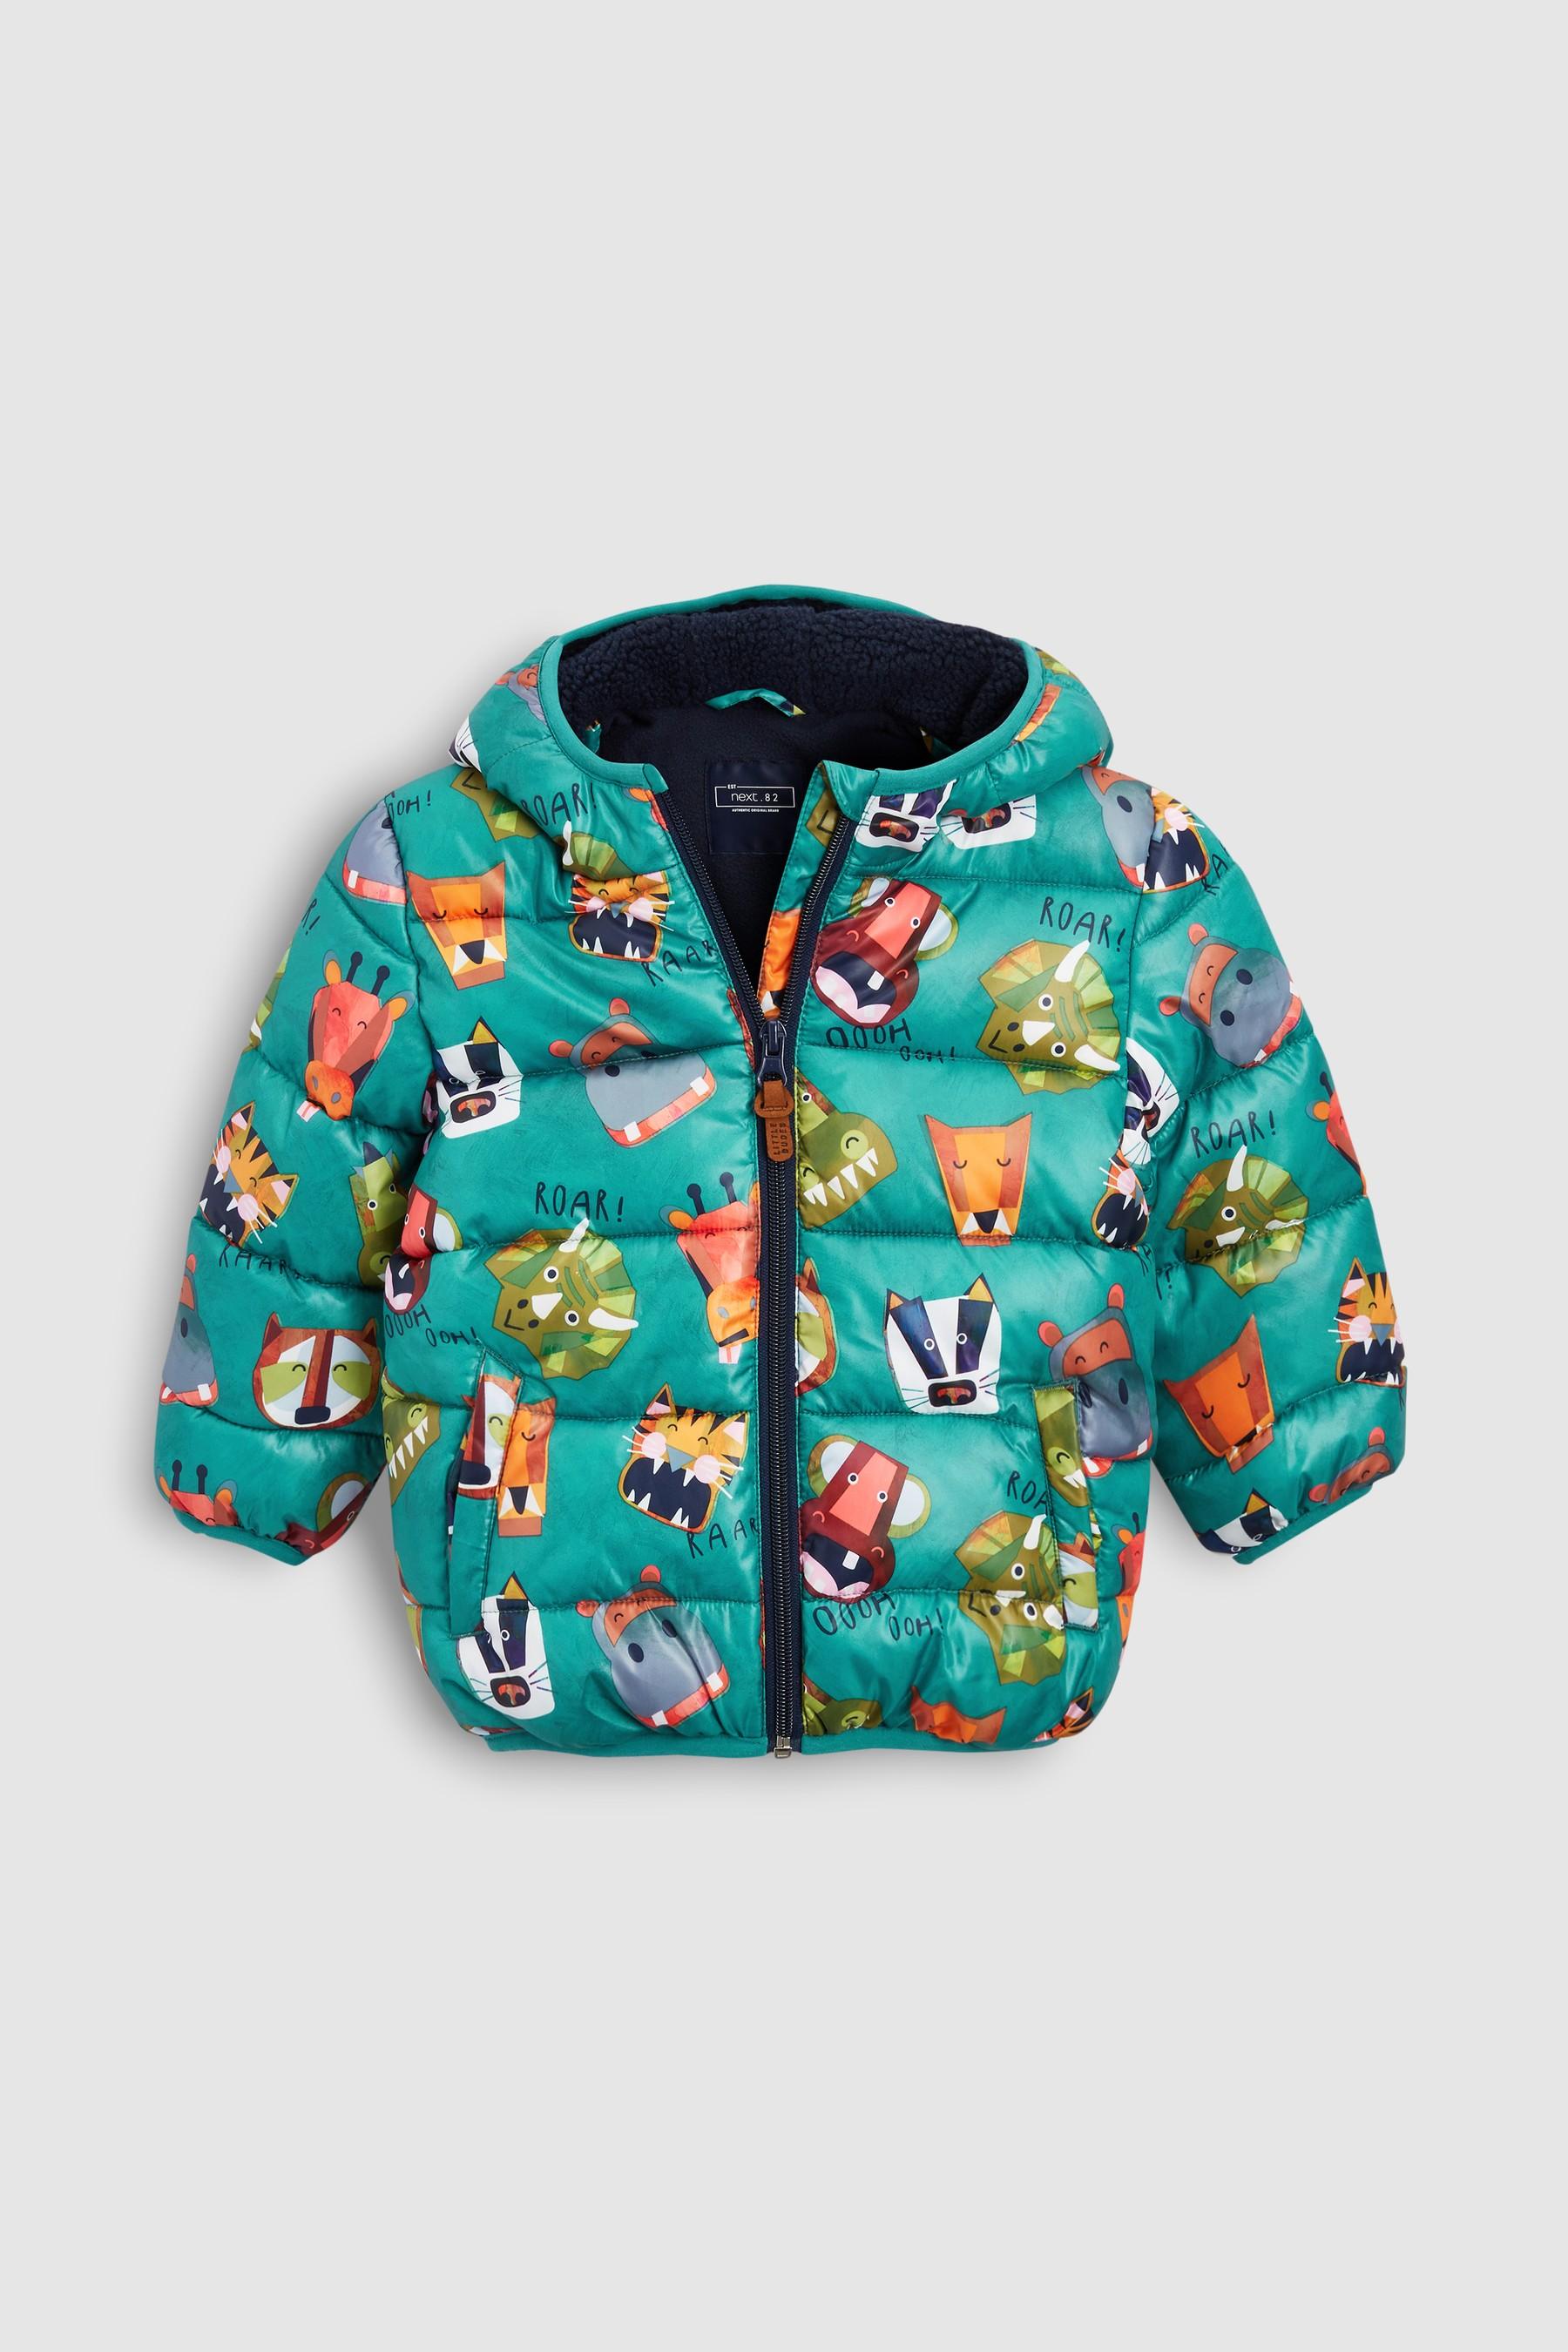 d4cd23a03 Boys Next Green Animal Print Padded Jacket (3mths-7yrs) - Green ...